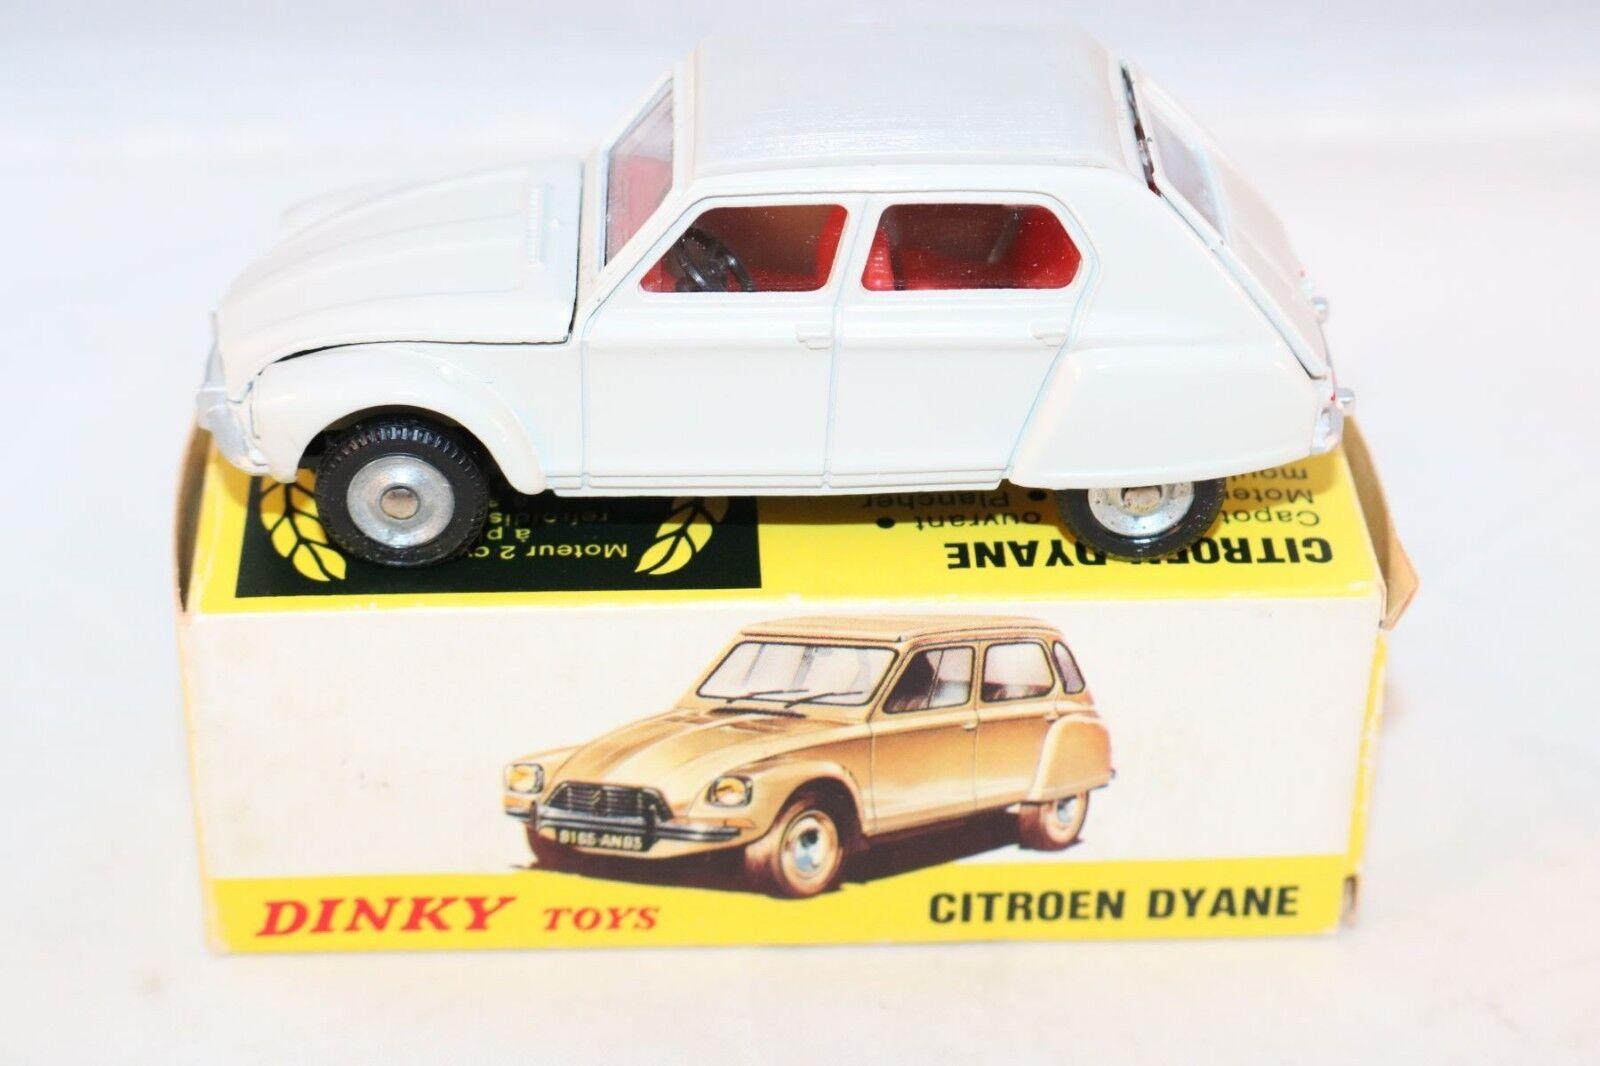 Dinky Toys 1413 Citroen Dyane grau perfect mint in very near mint box